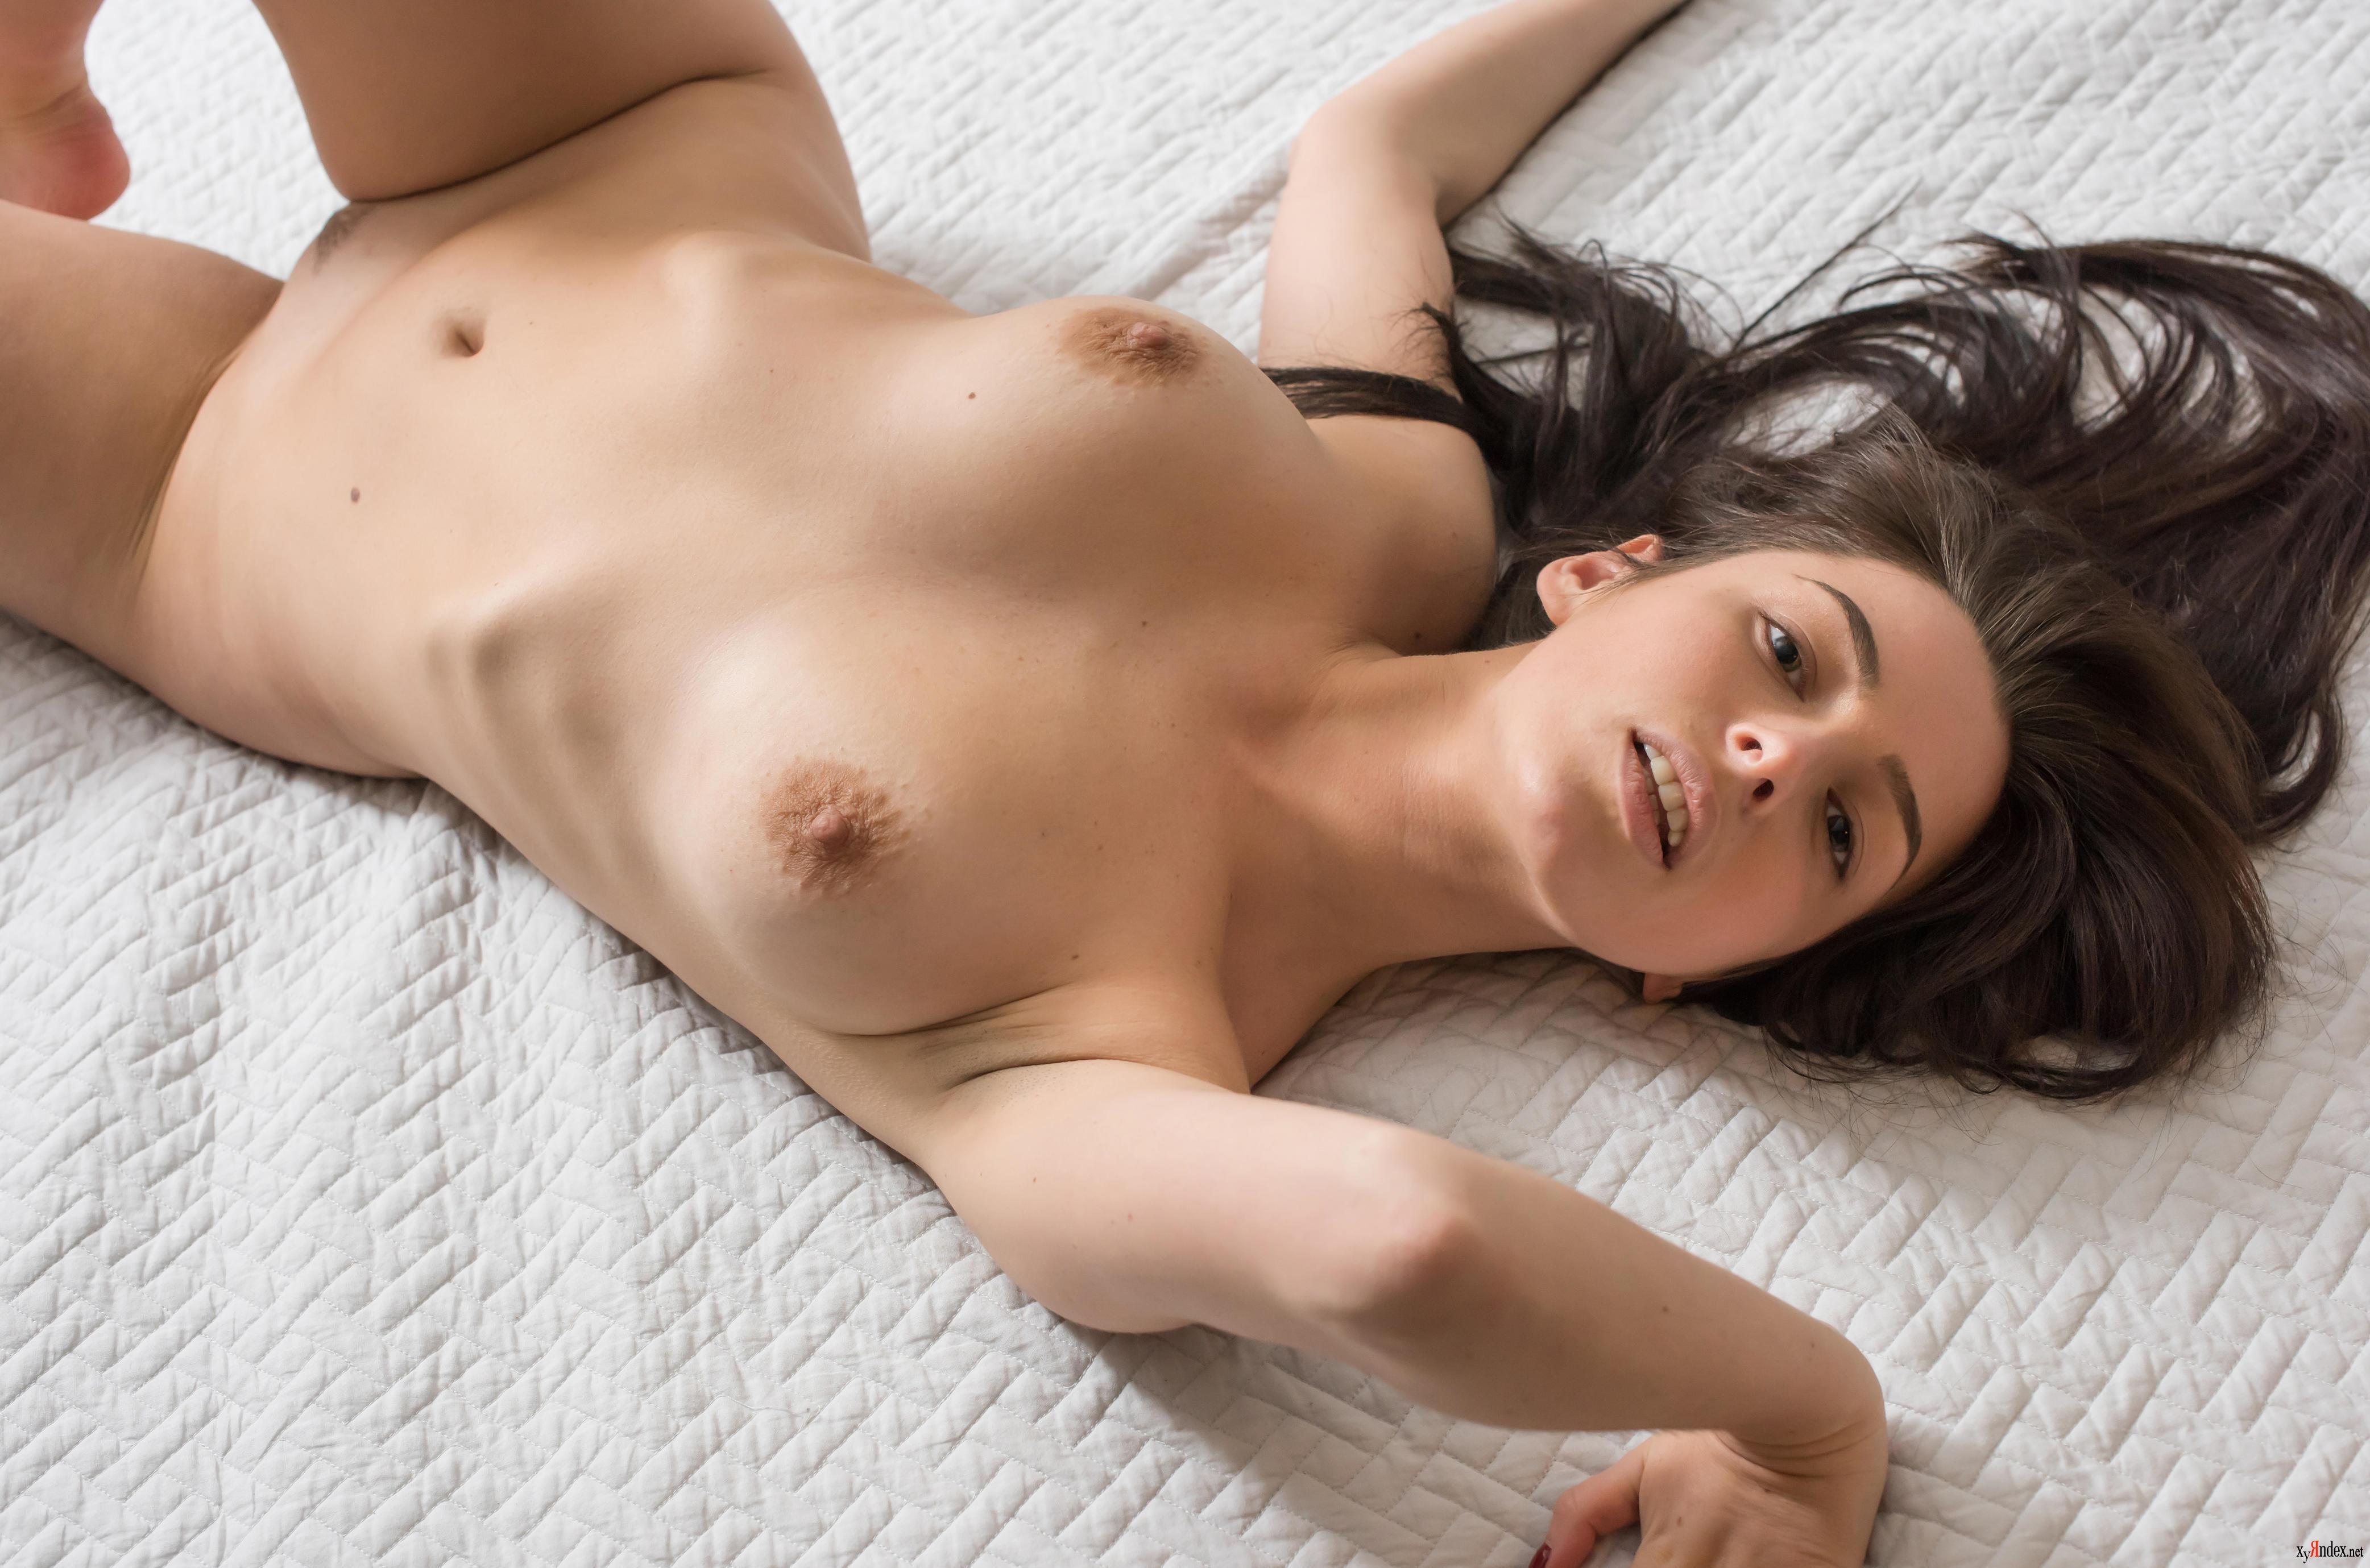 Marina Visconti Nude